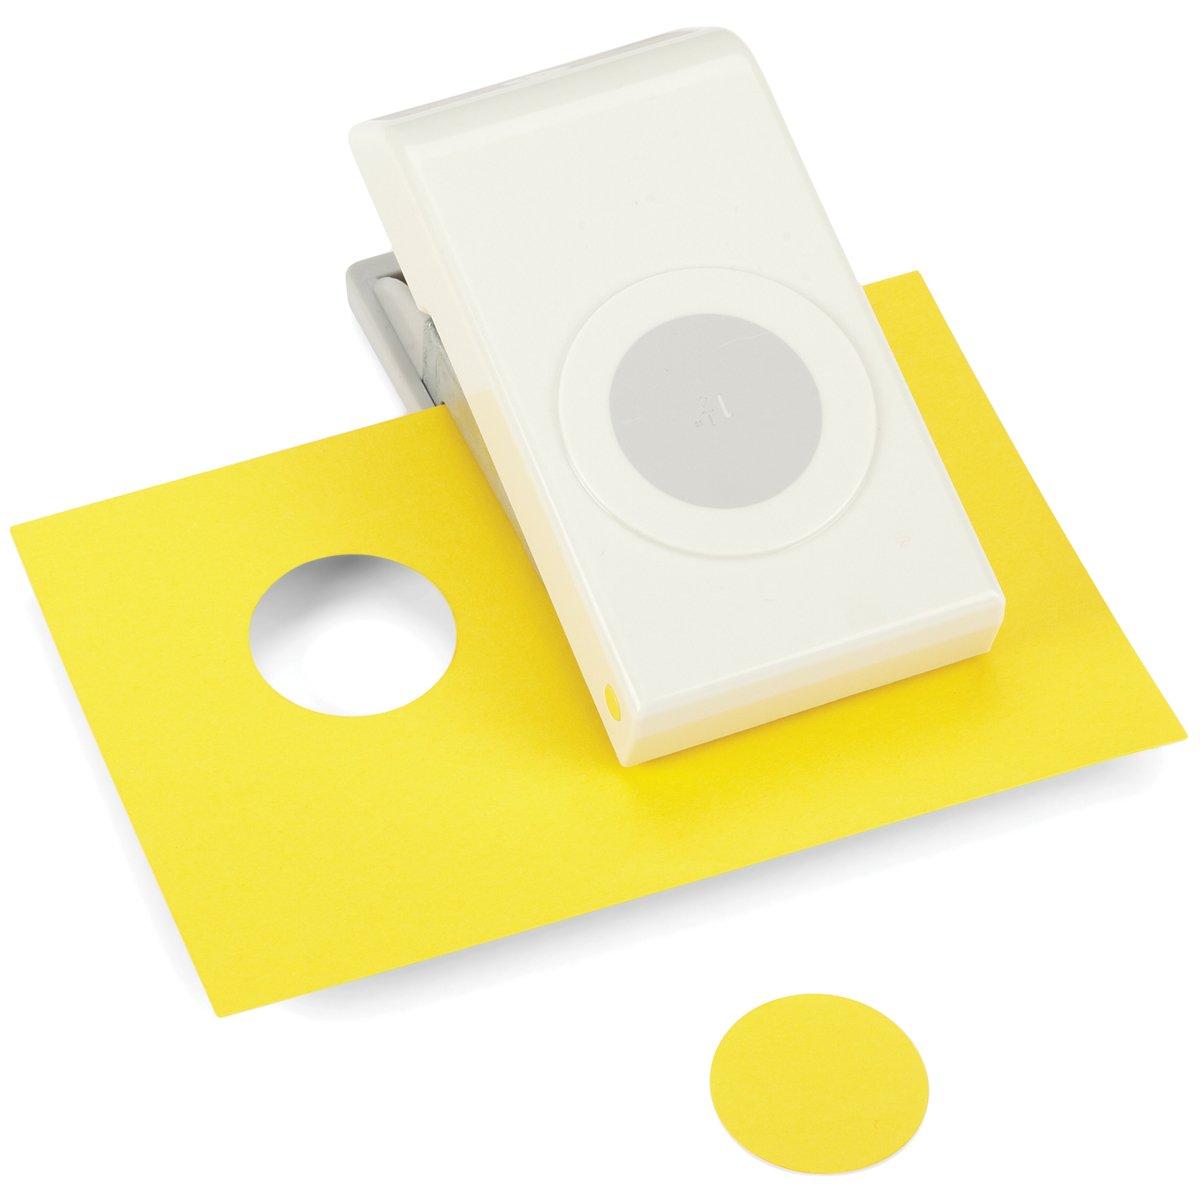 EK Tools Circle Punch, 1.25-Inch, New Package